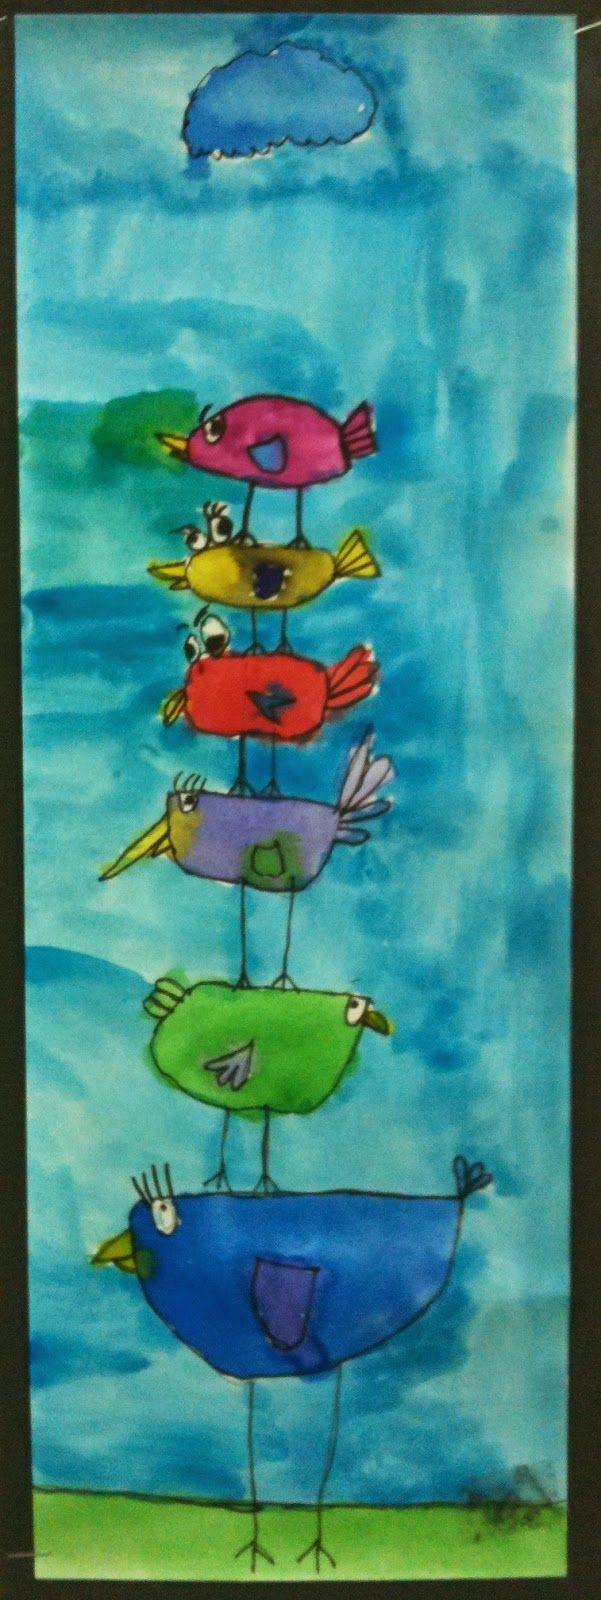 Art Room Blog: Student Art Shows